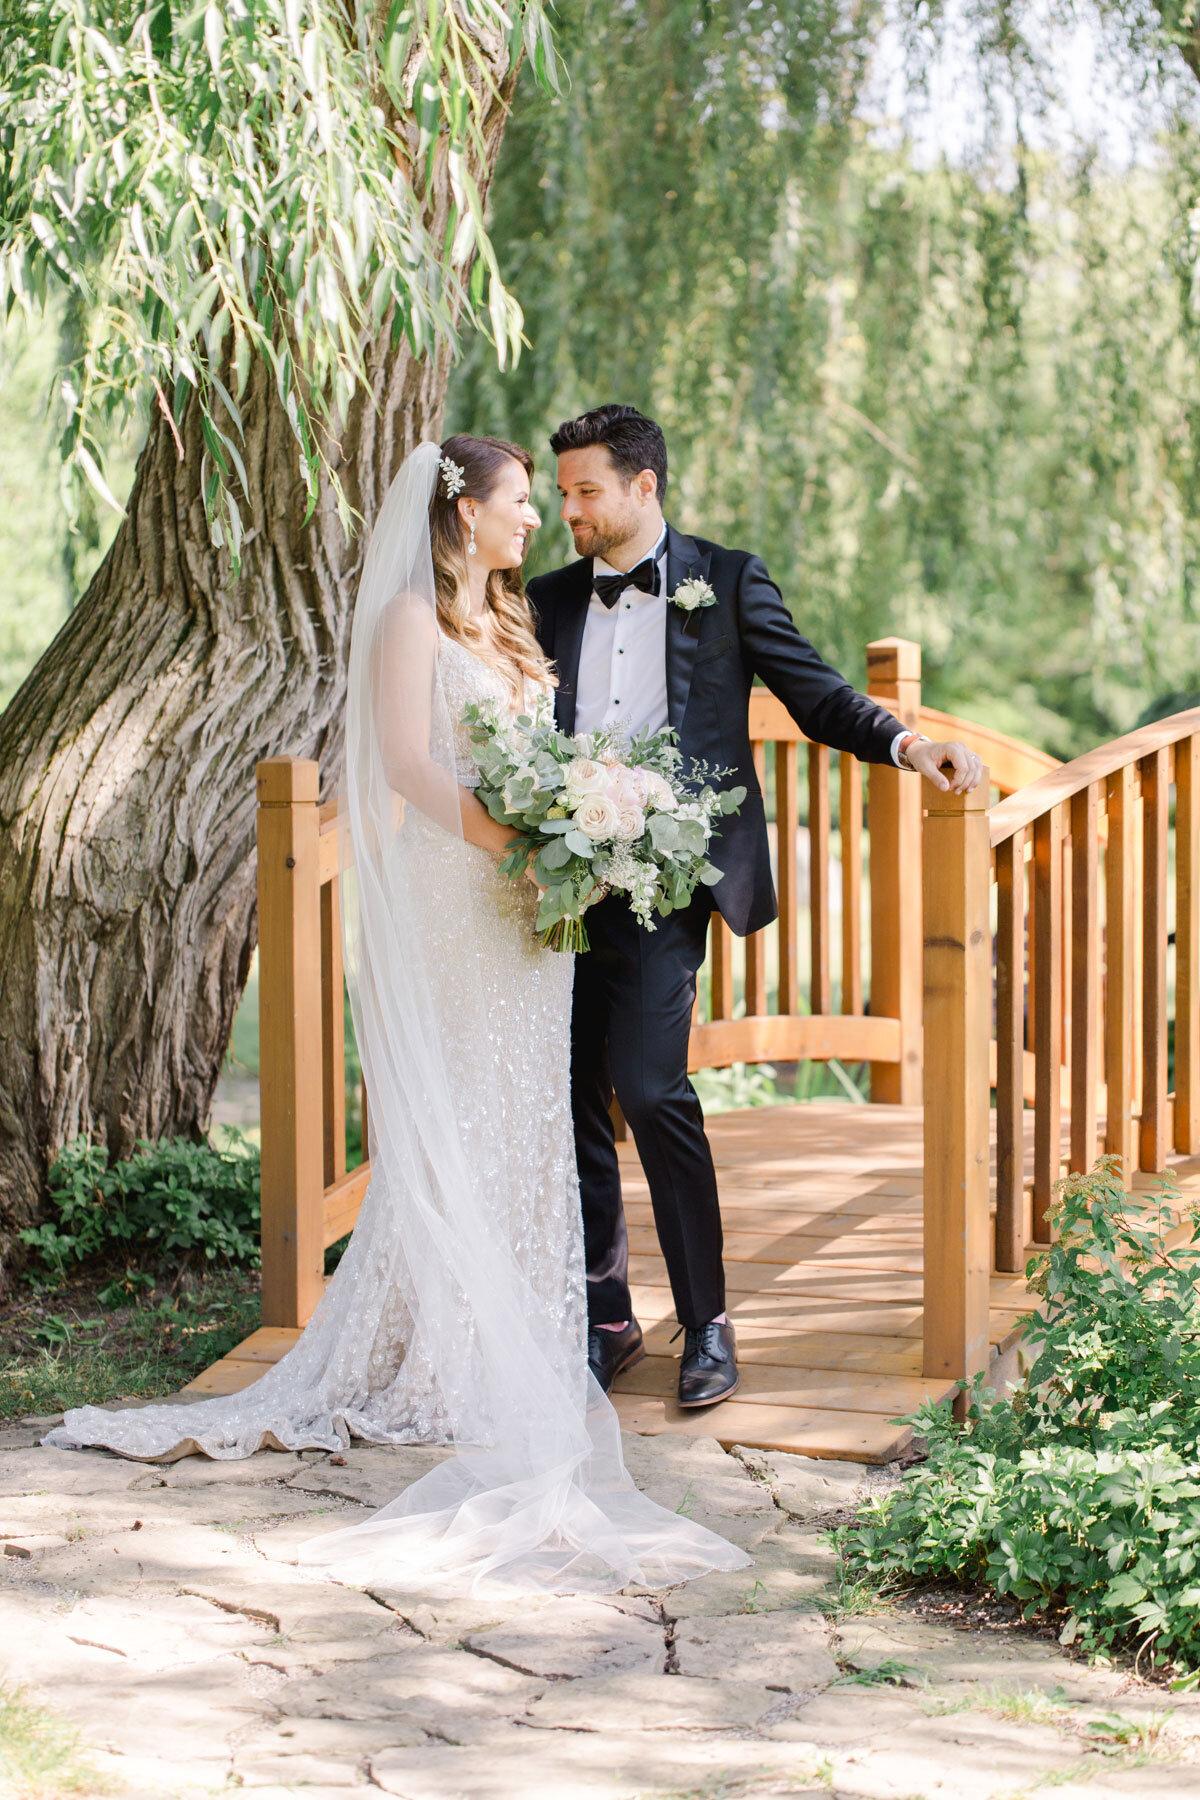 Chateau-des-Charmes-Wedding-Summer-Vineyard-Bride-Niagara-on-the-Lake-photos-by-Gemini-Photography-Ontario-0021.jpg